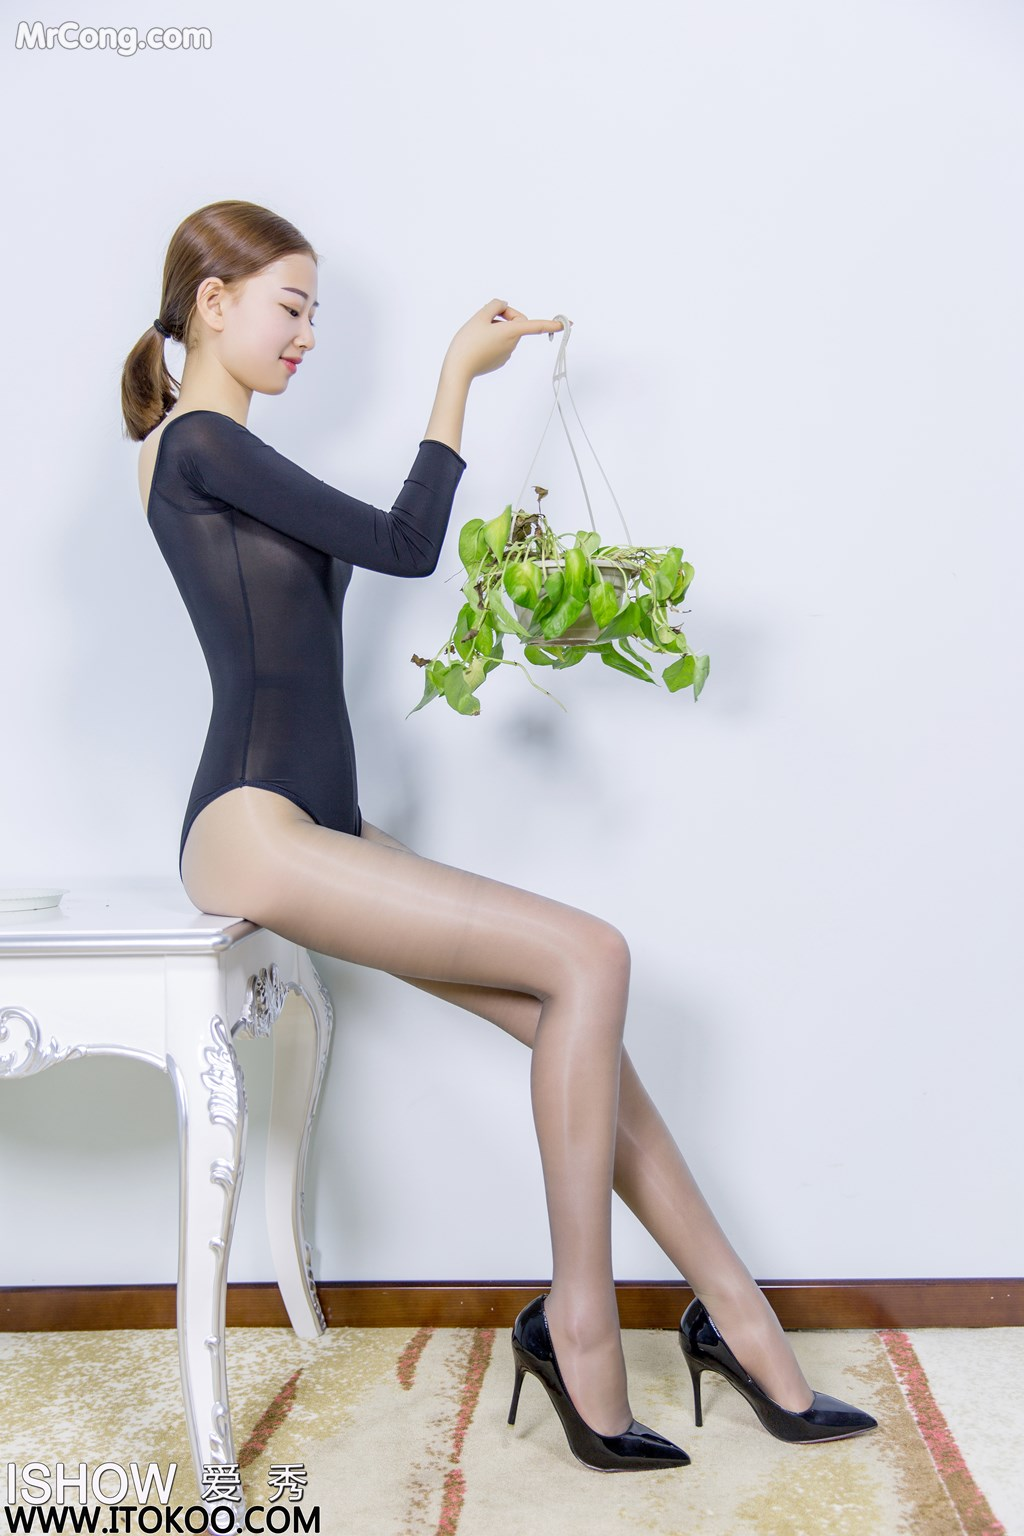 Image ISHOW-No.151-Han-Zhi-Ying-Flora-MrCong.com-009 in post ISHOW No.151: Người mẫu Han Zhi Ying (寒栀樱Flora) (31 ảnh)